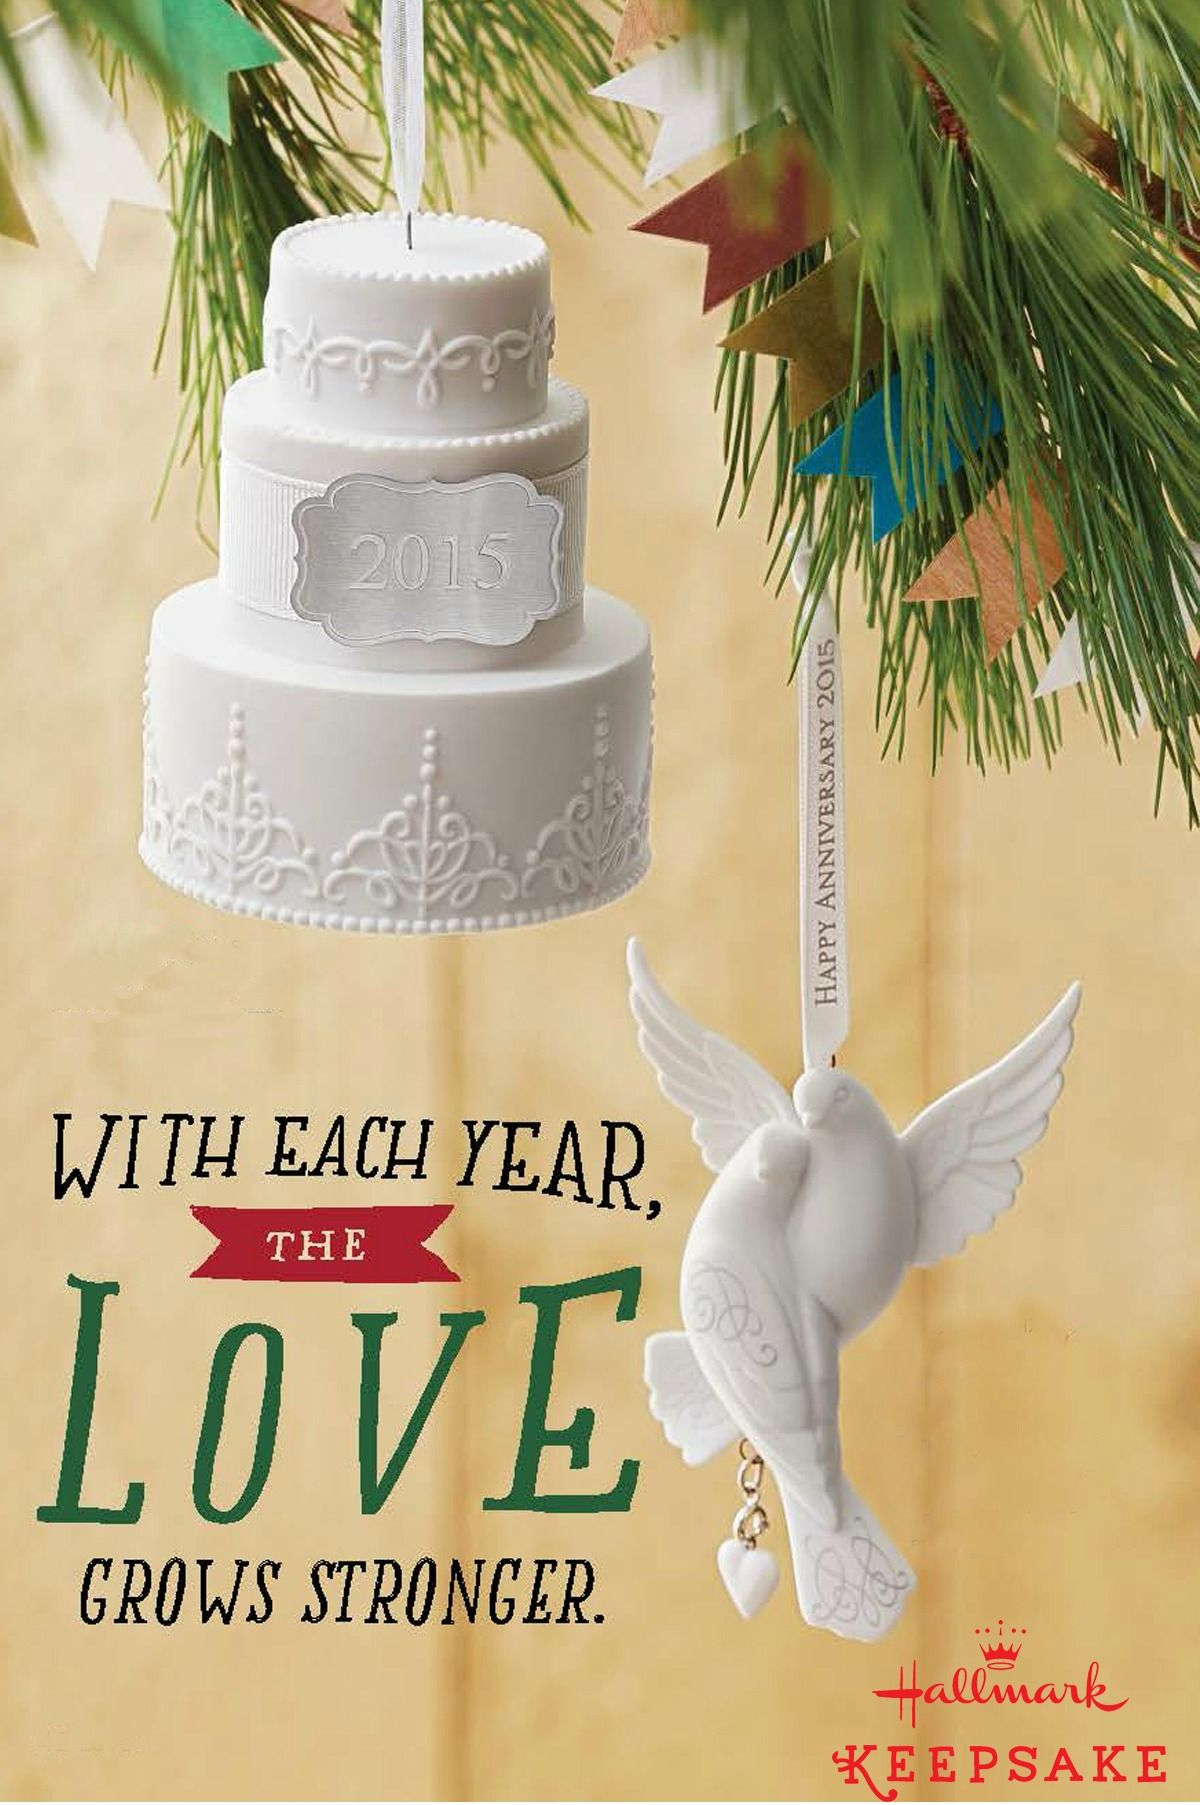 Looking for wedding t or anniversary t ideas Hallmark